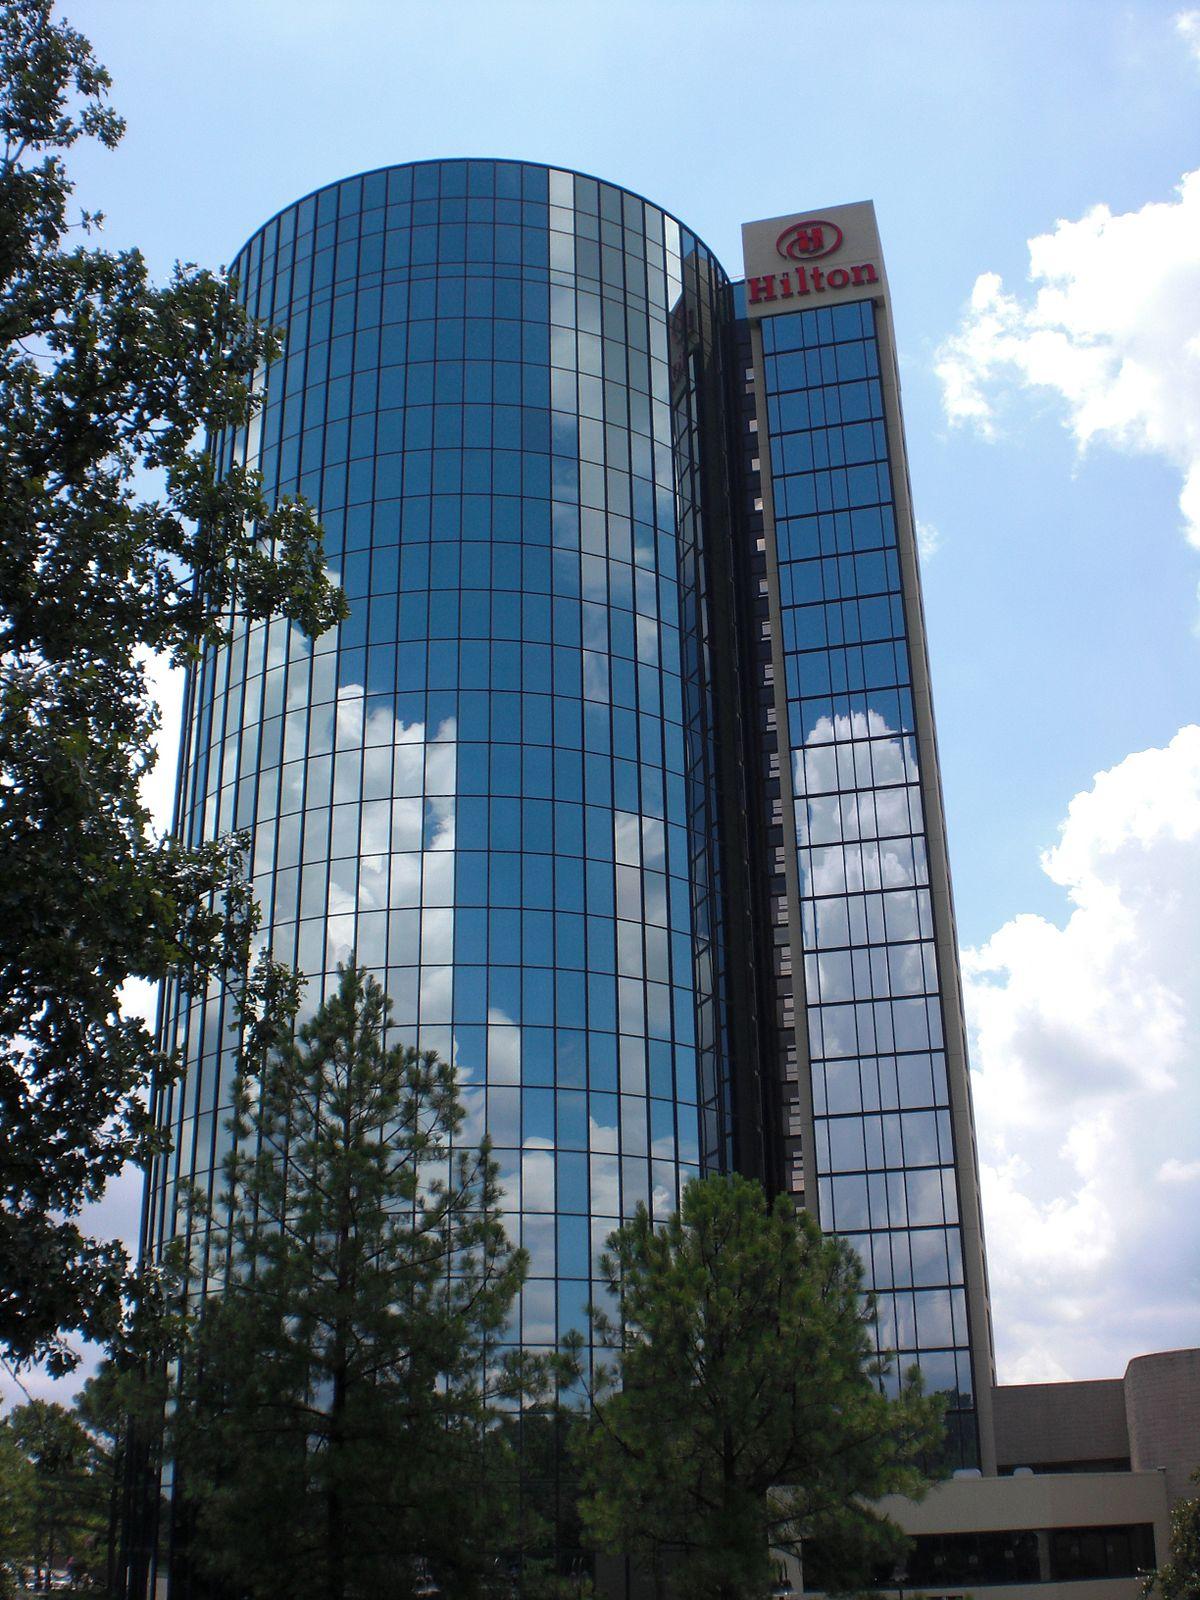 Hilton Memphis - Wikipedia